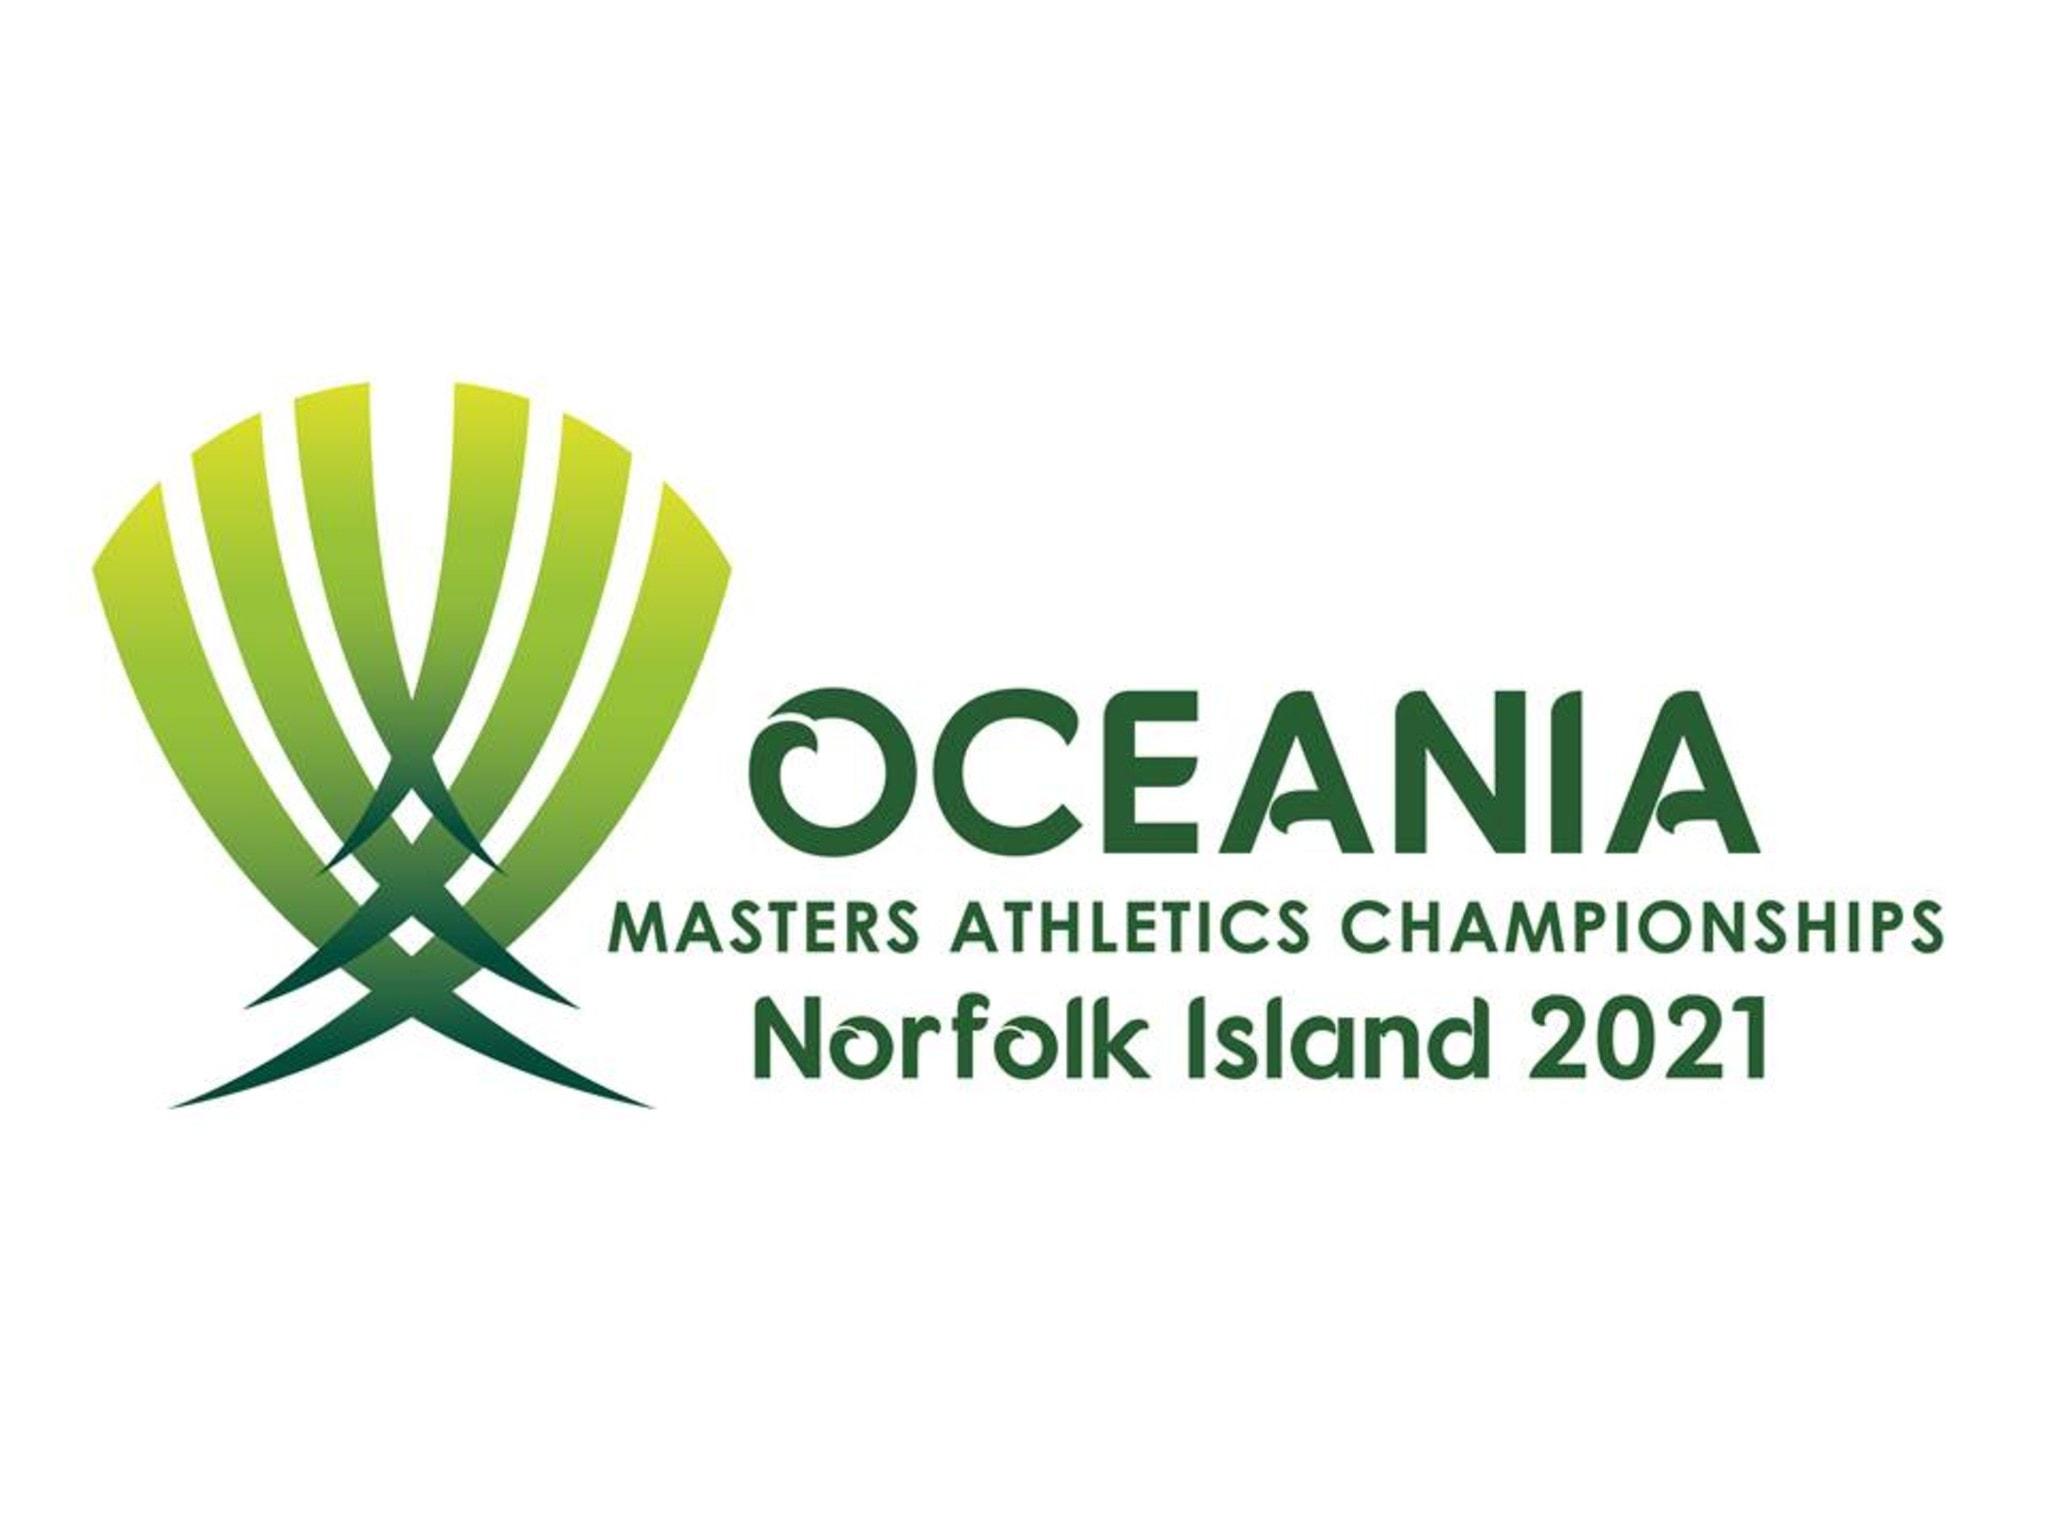 Norfolk Island Oceania Masters Athletics Championships 2021